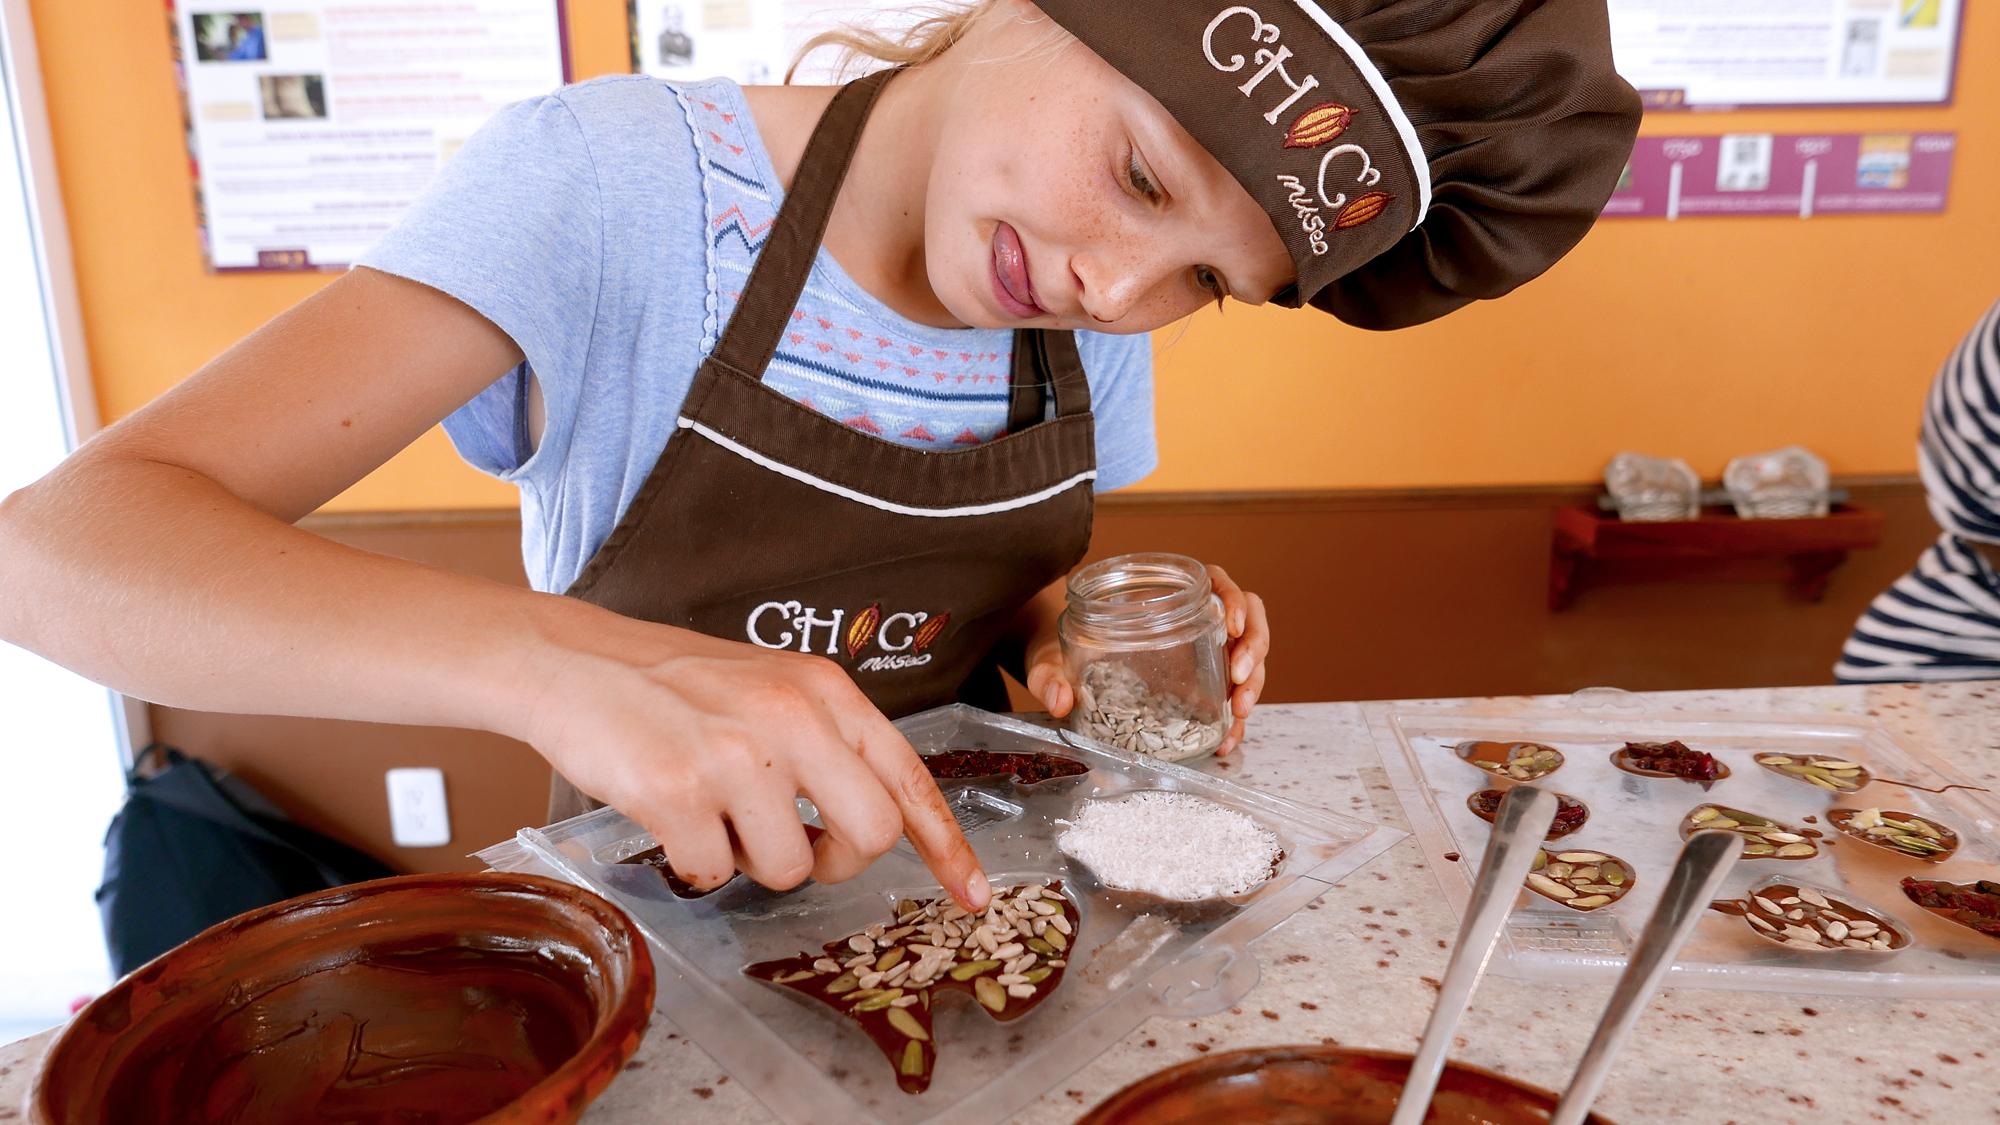 Anna is making chocolate by Choco Museo Puerto Vallarta